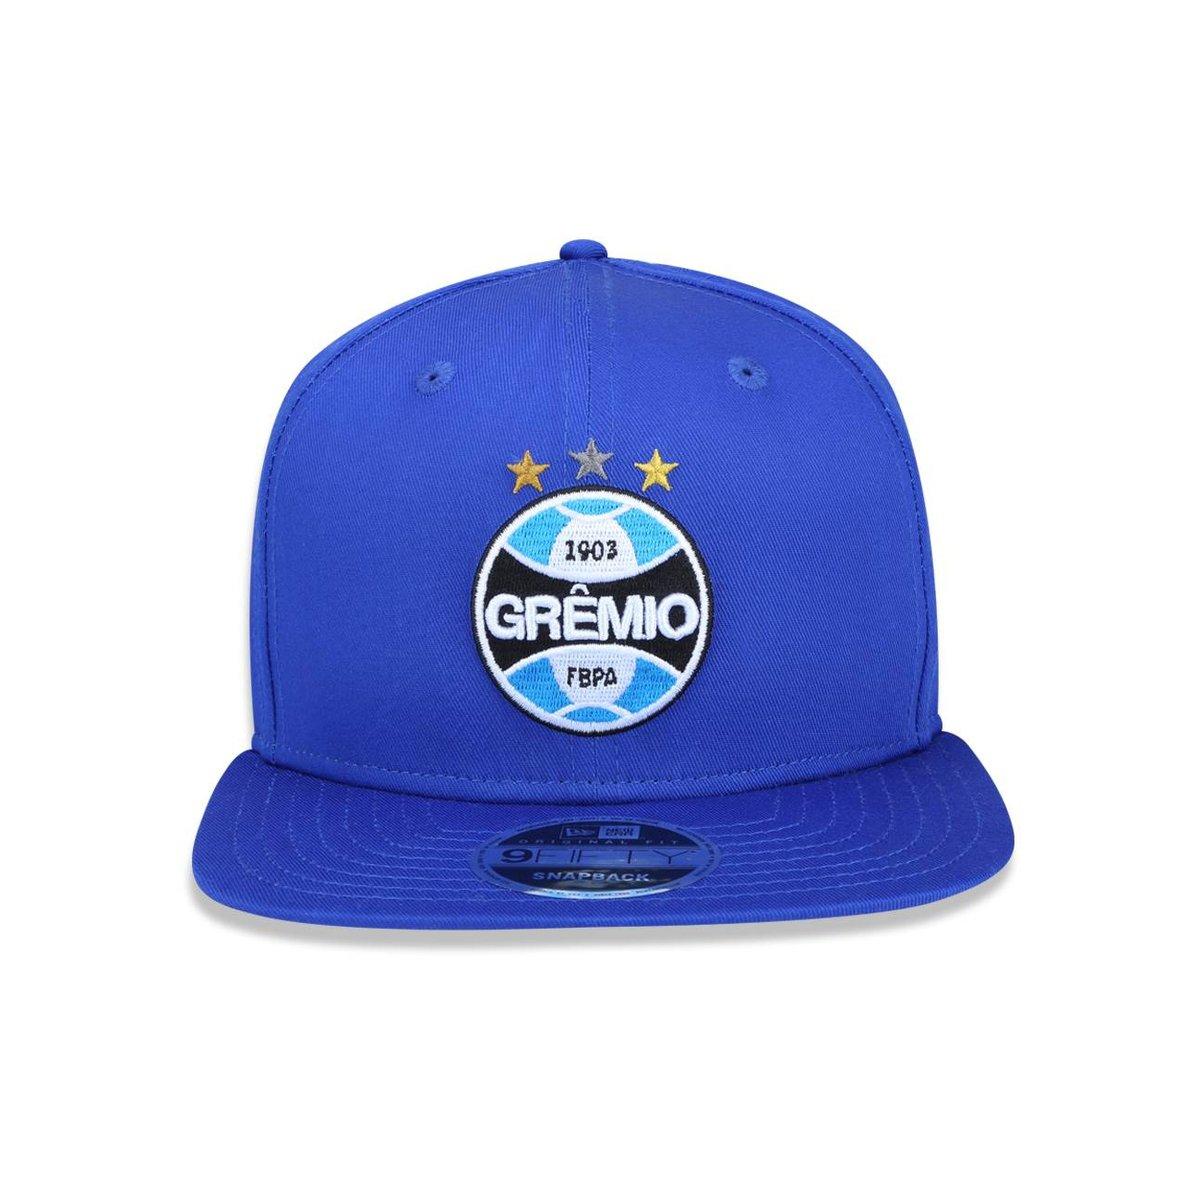 ... Boné 950 Original Fit Grêmio Futebol Aba Reta Snapback New Era ... 8945d54d775